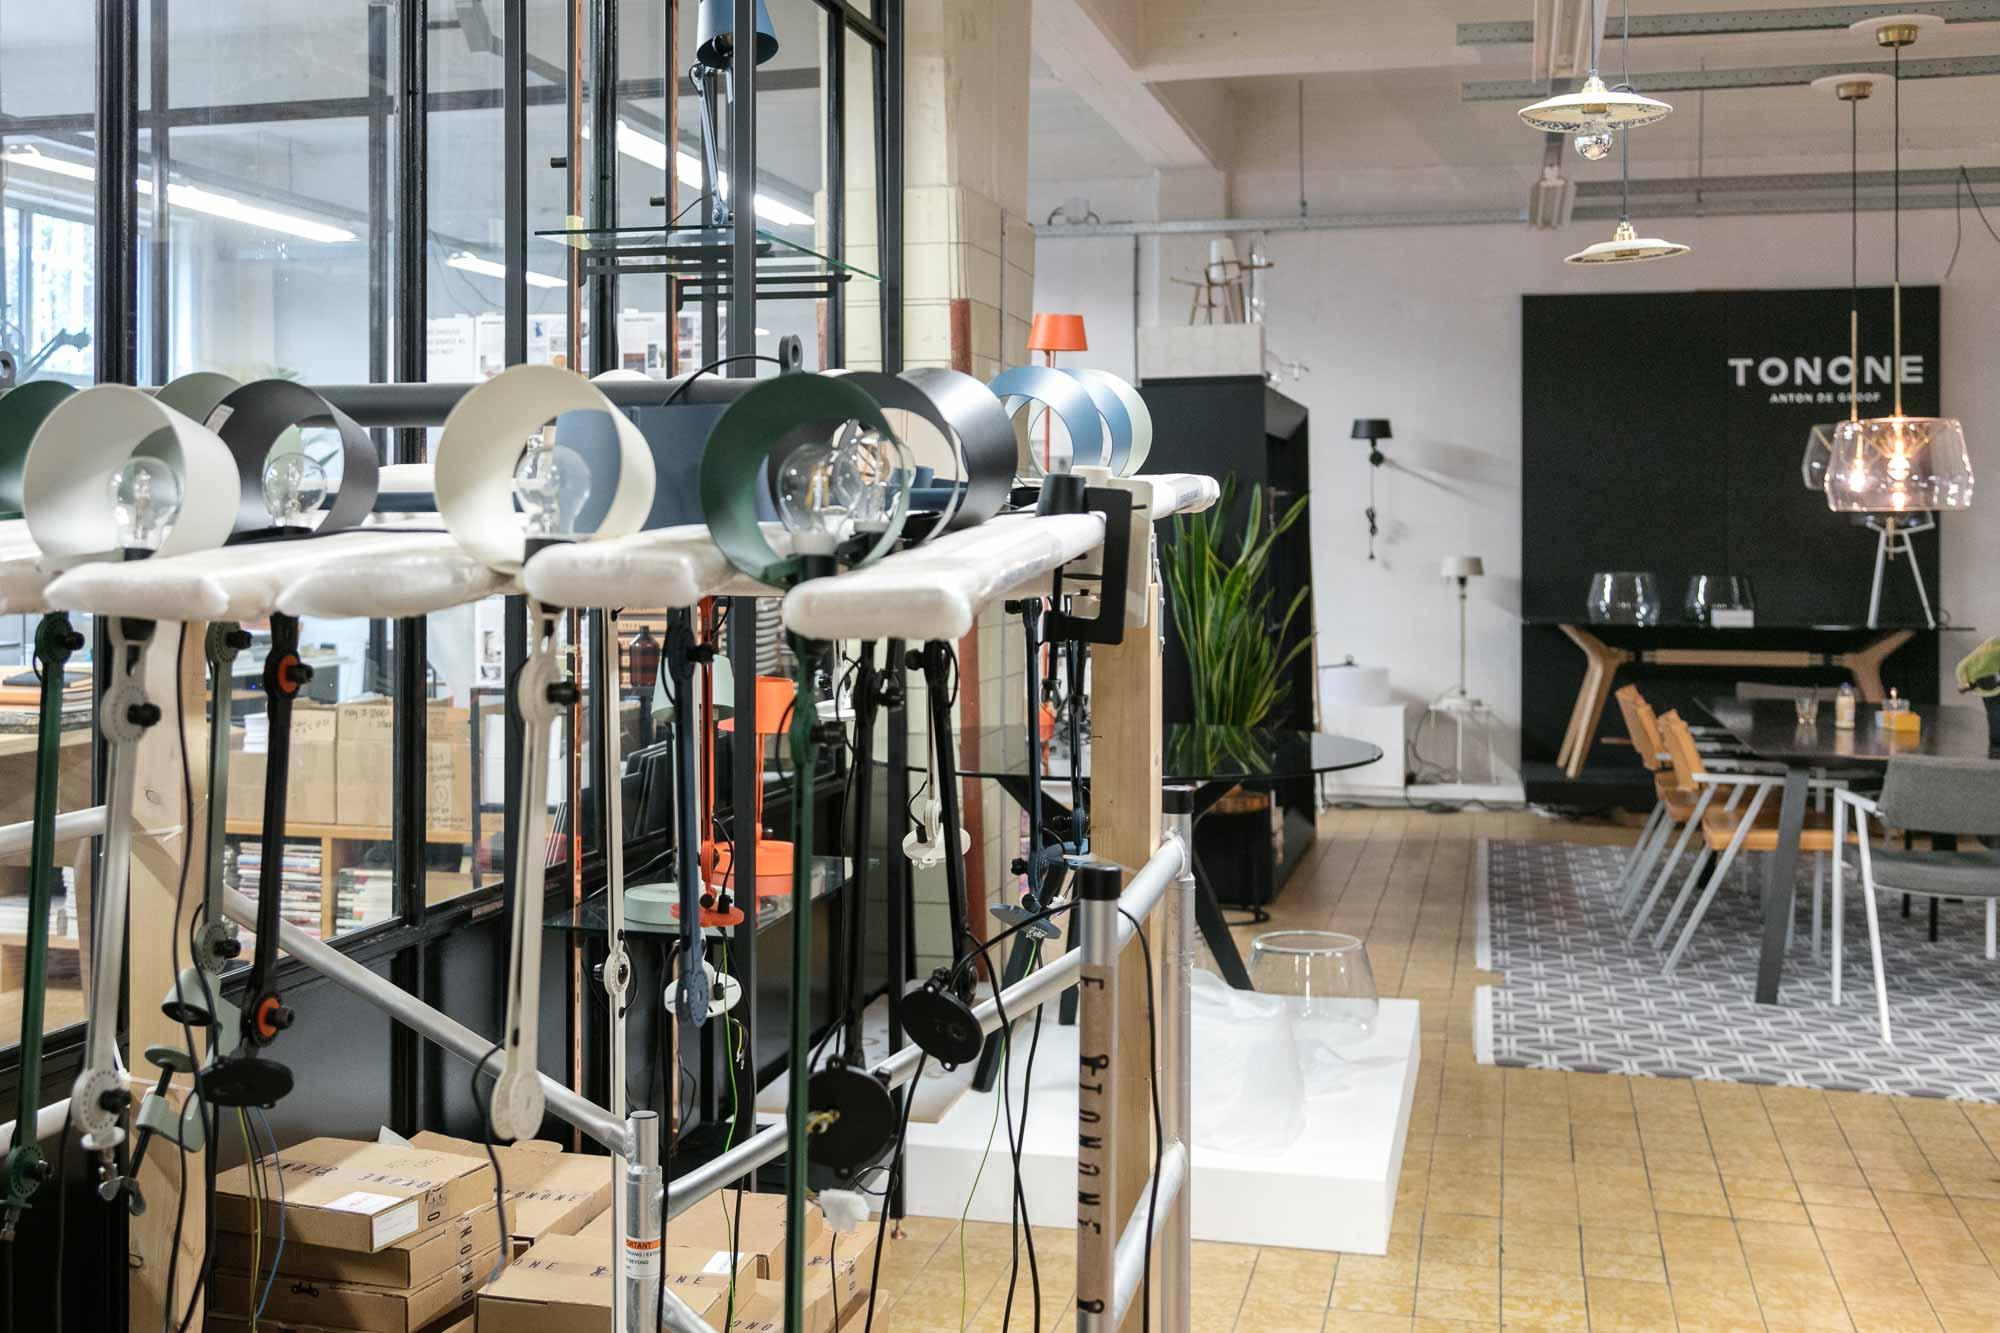 tonone lampen design blog prchtg